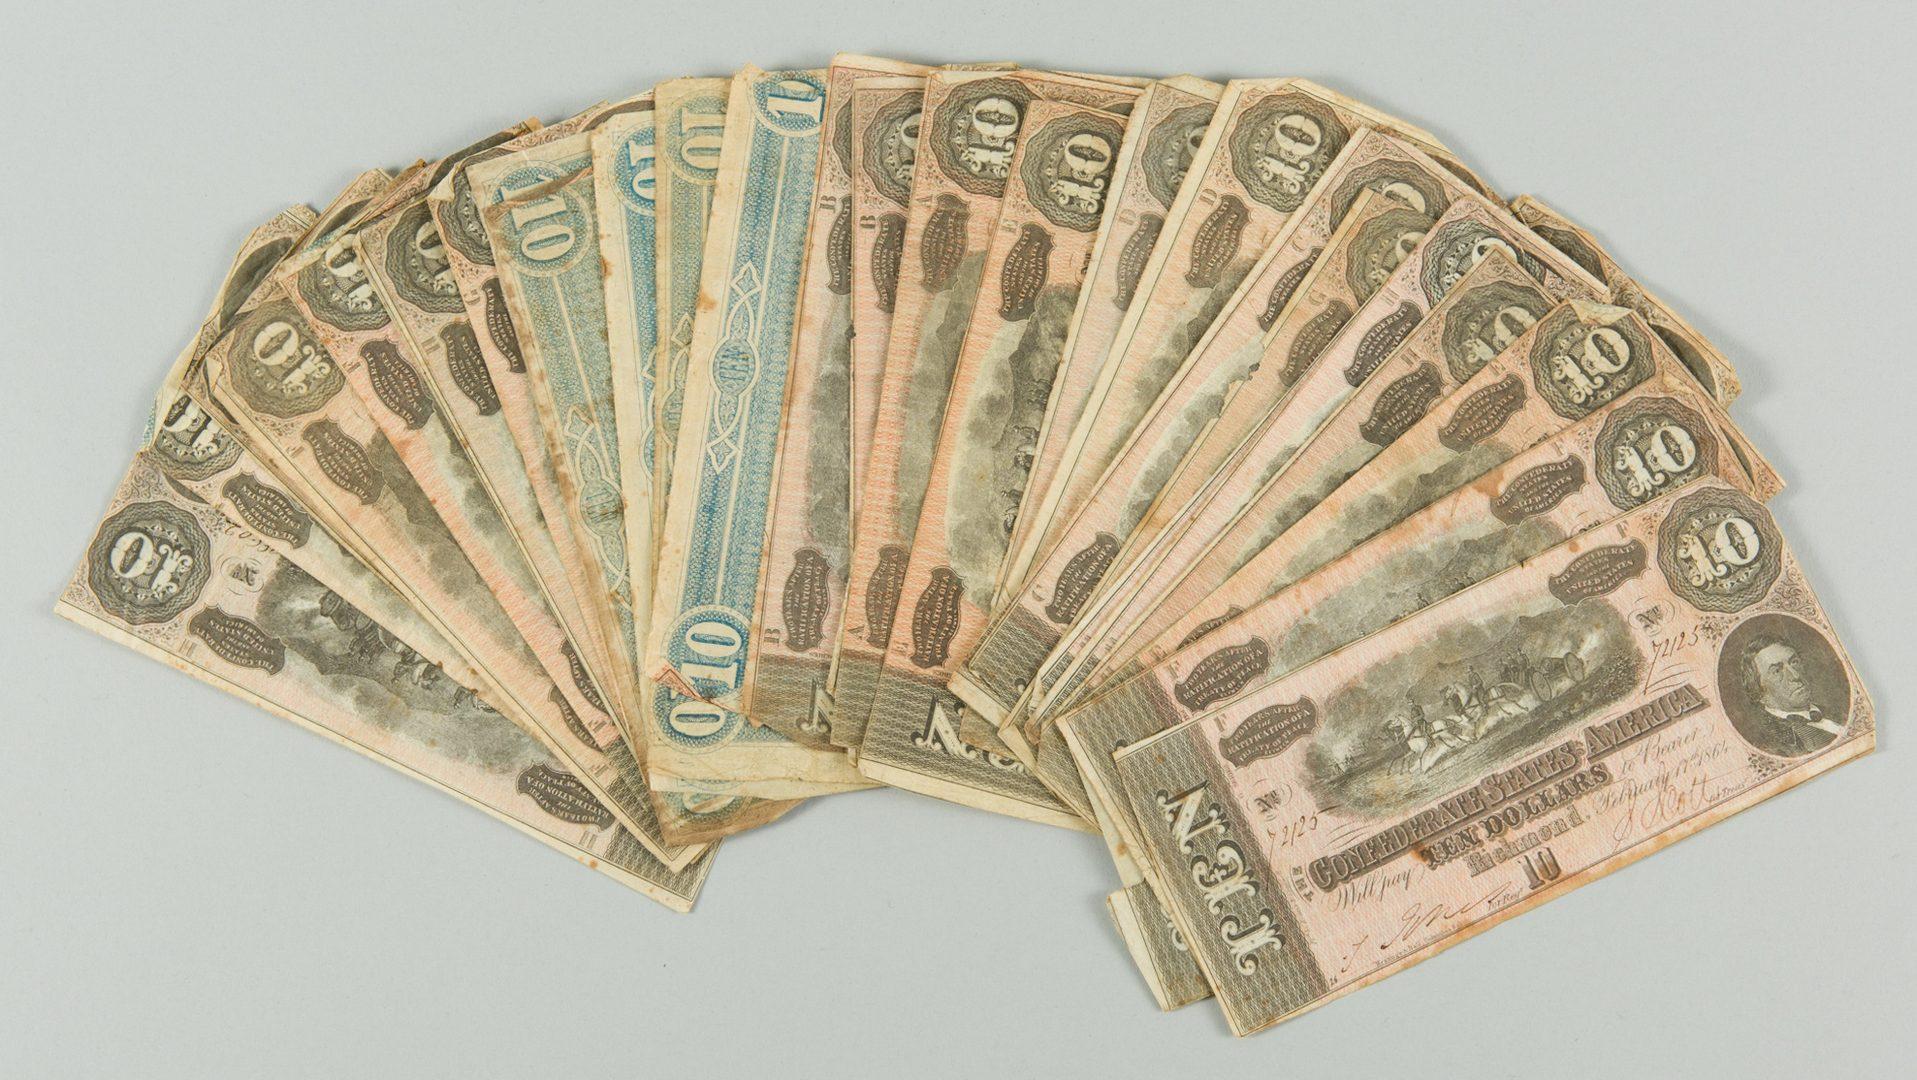 Lot 232: 32 Confederate States of America (CSA) Ten Dollar Bills